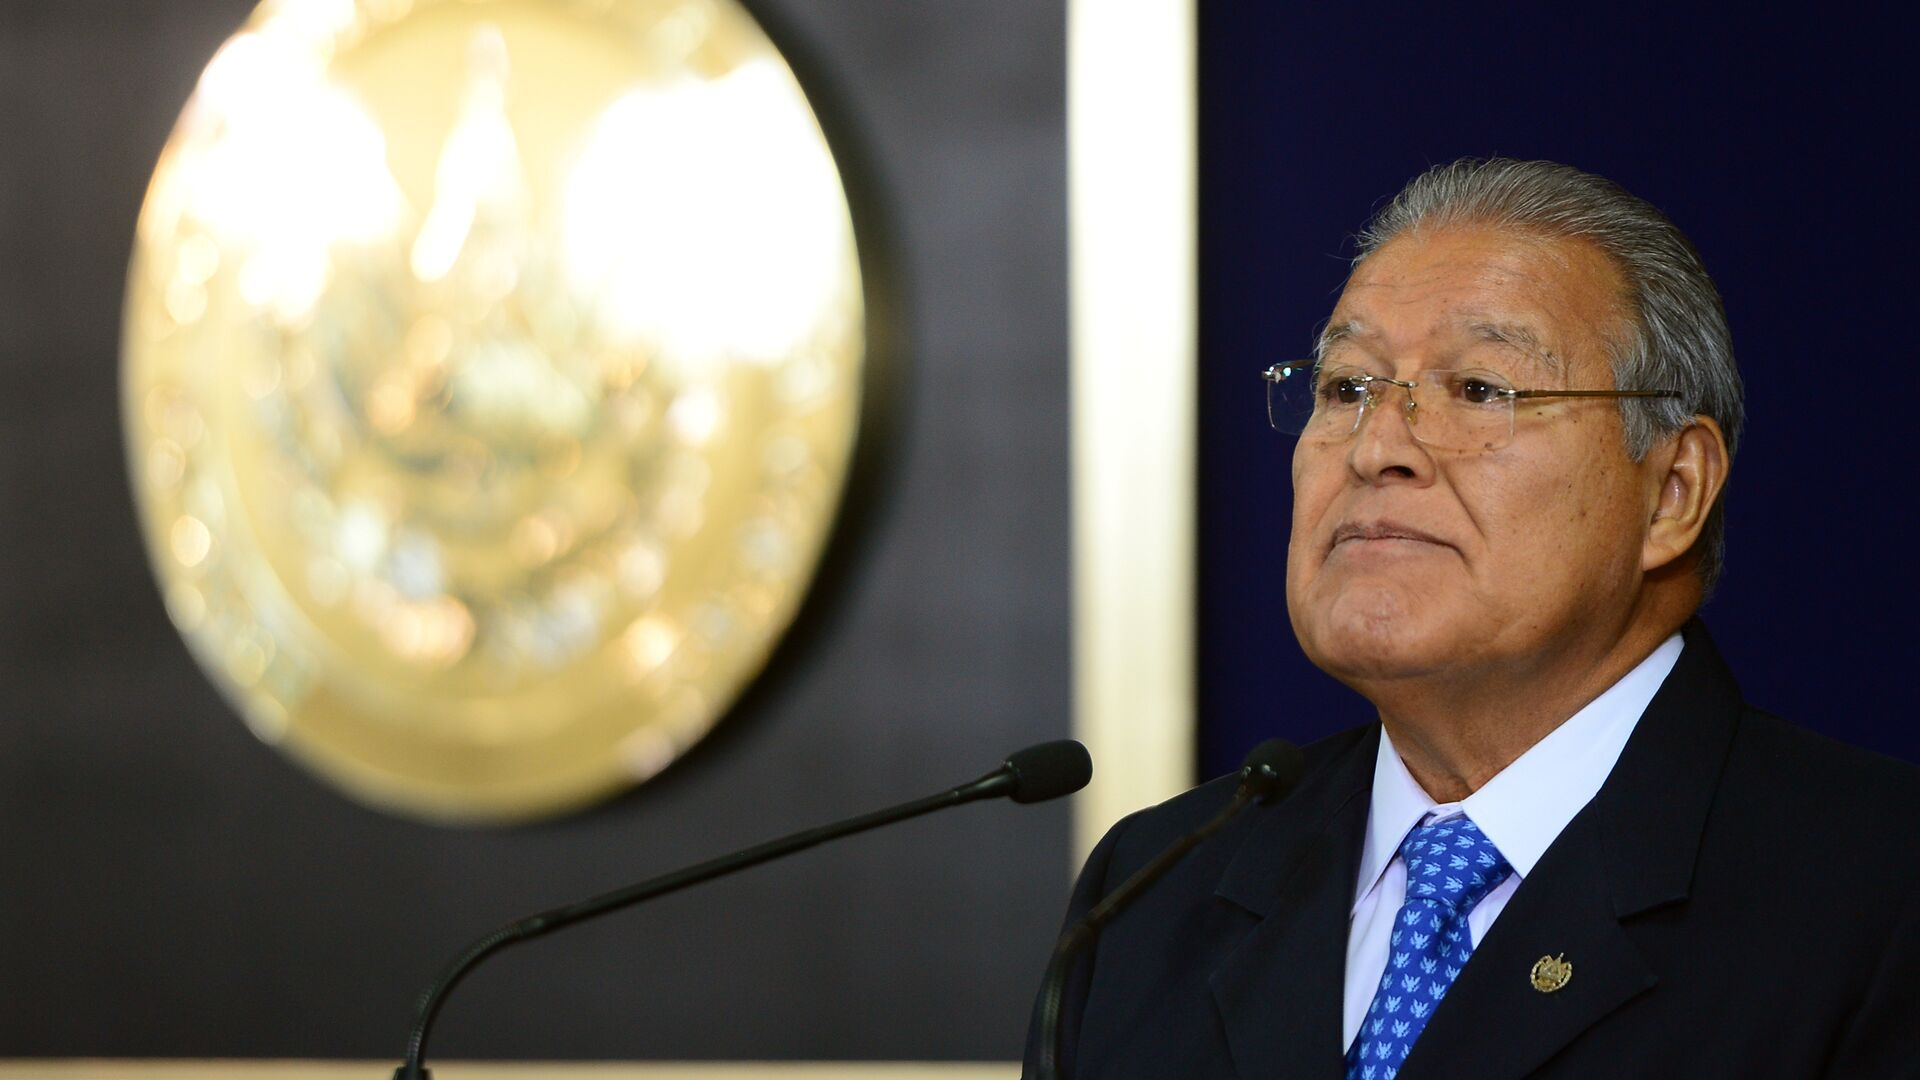 El presidente salvadoreño, Salvador Sánchez Cerén - Sputnik Mundo, 1920, 30.07.2021